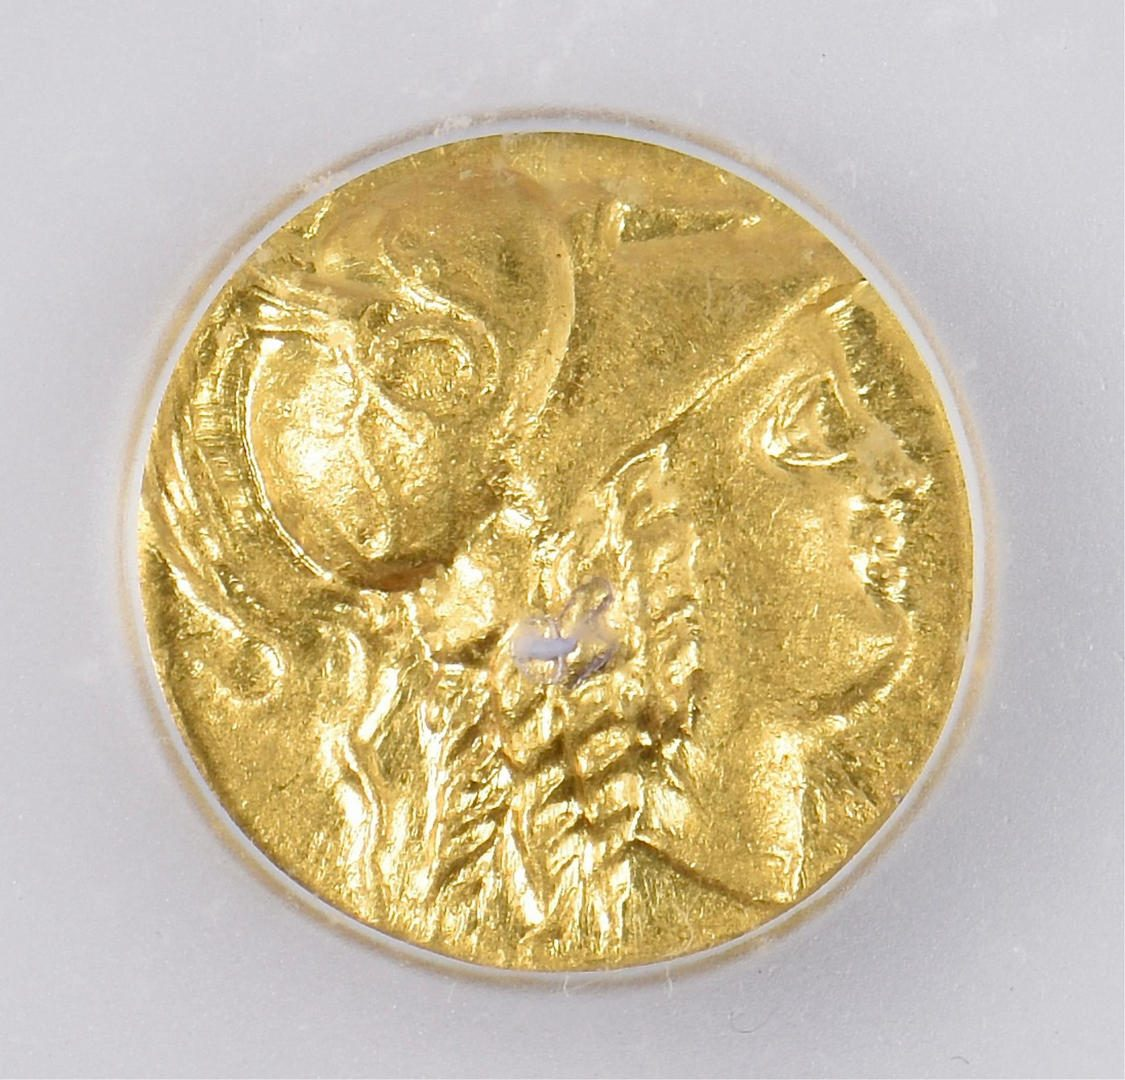 Lot 342: Alexander the Great AV Stater Coin, Citium Mint